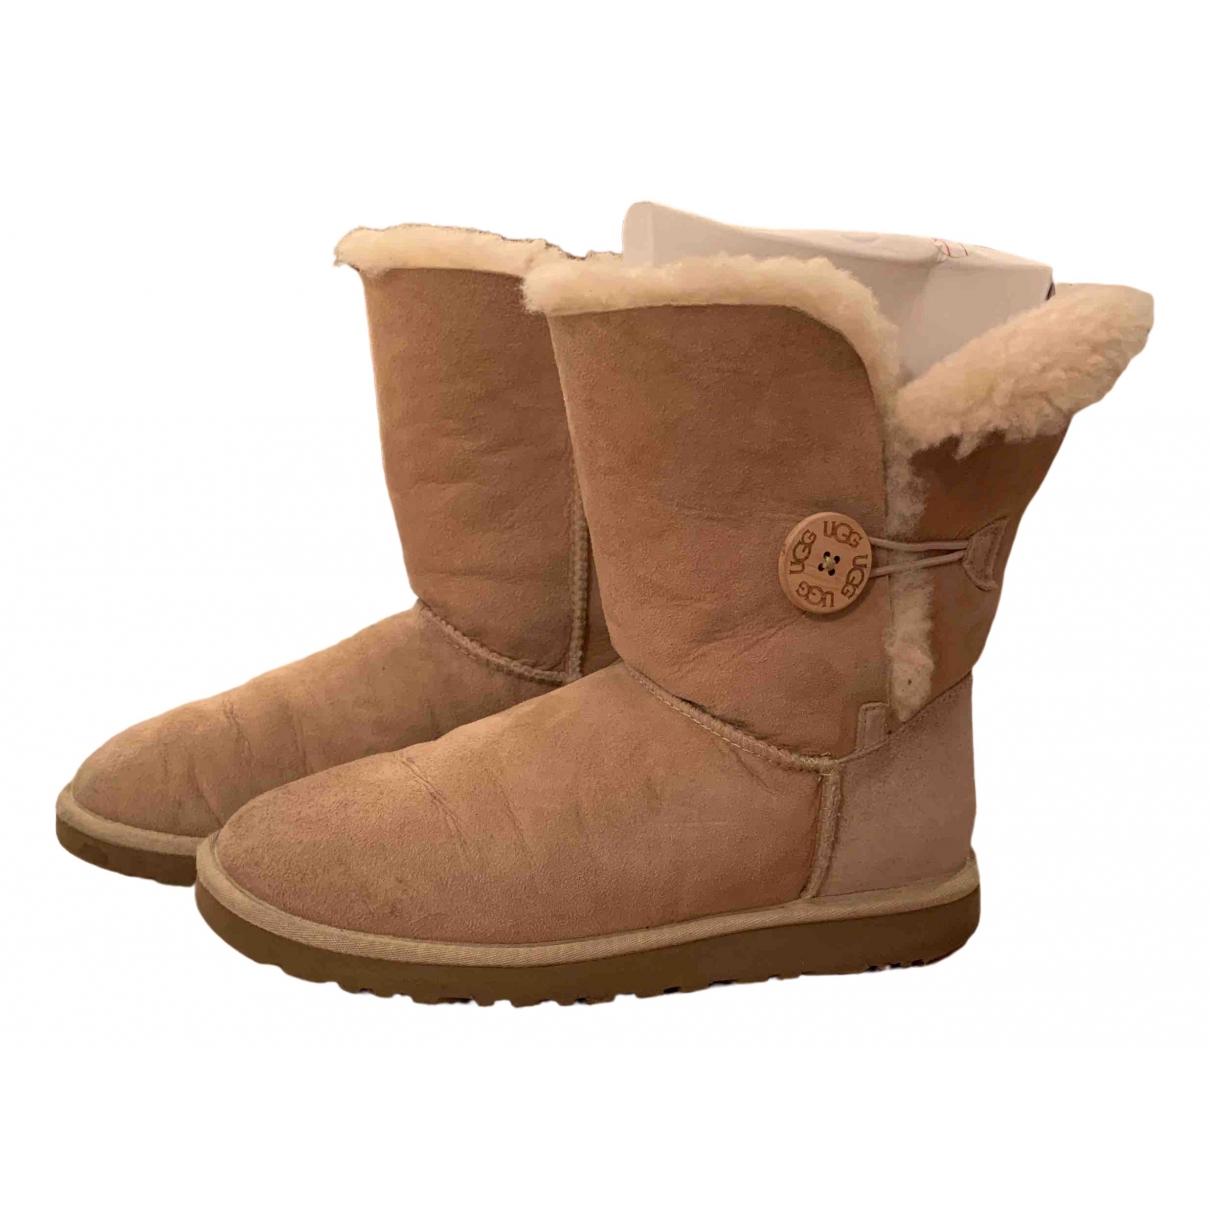 Ugg \N Beige Suede Boots for Women 39 EU